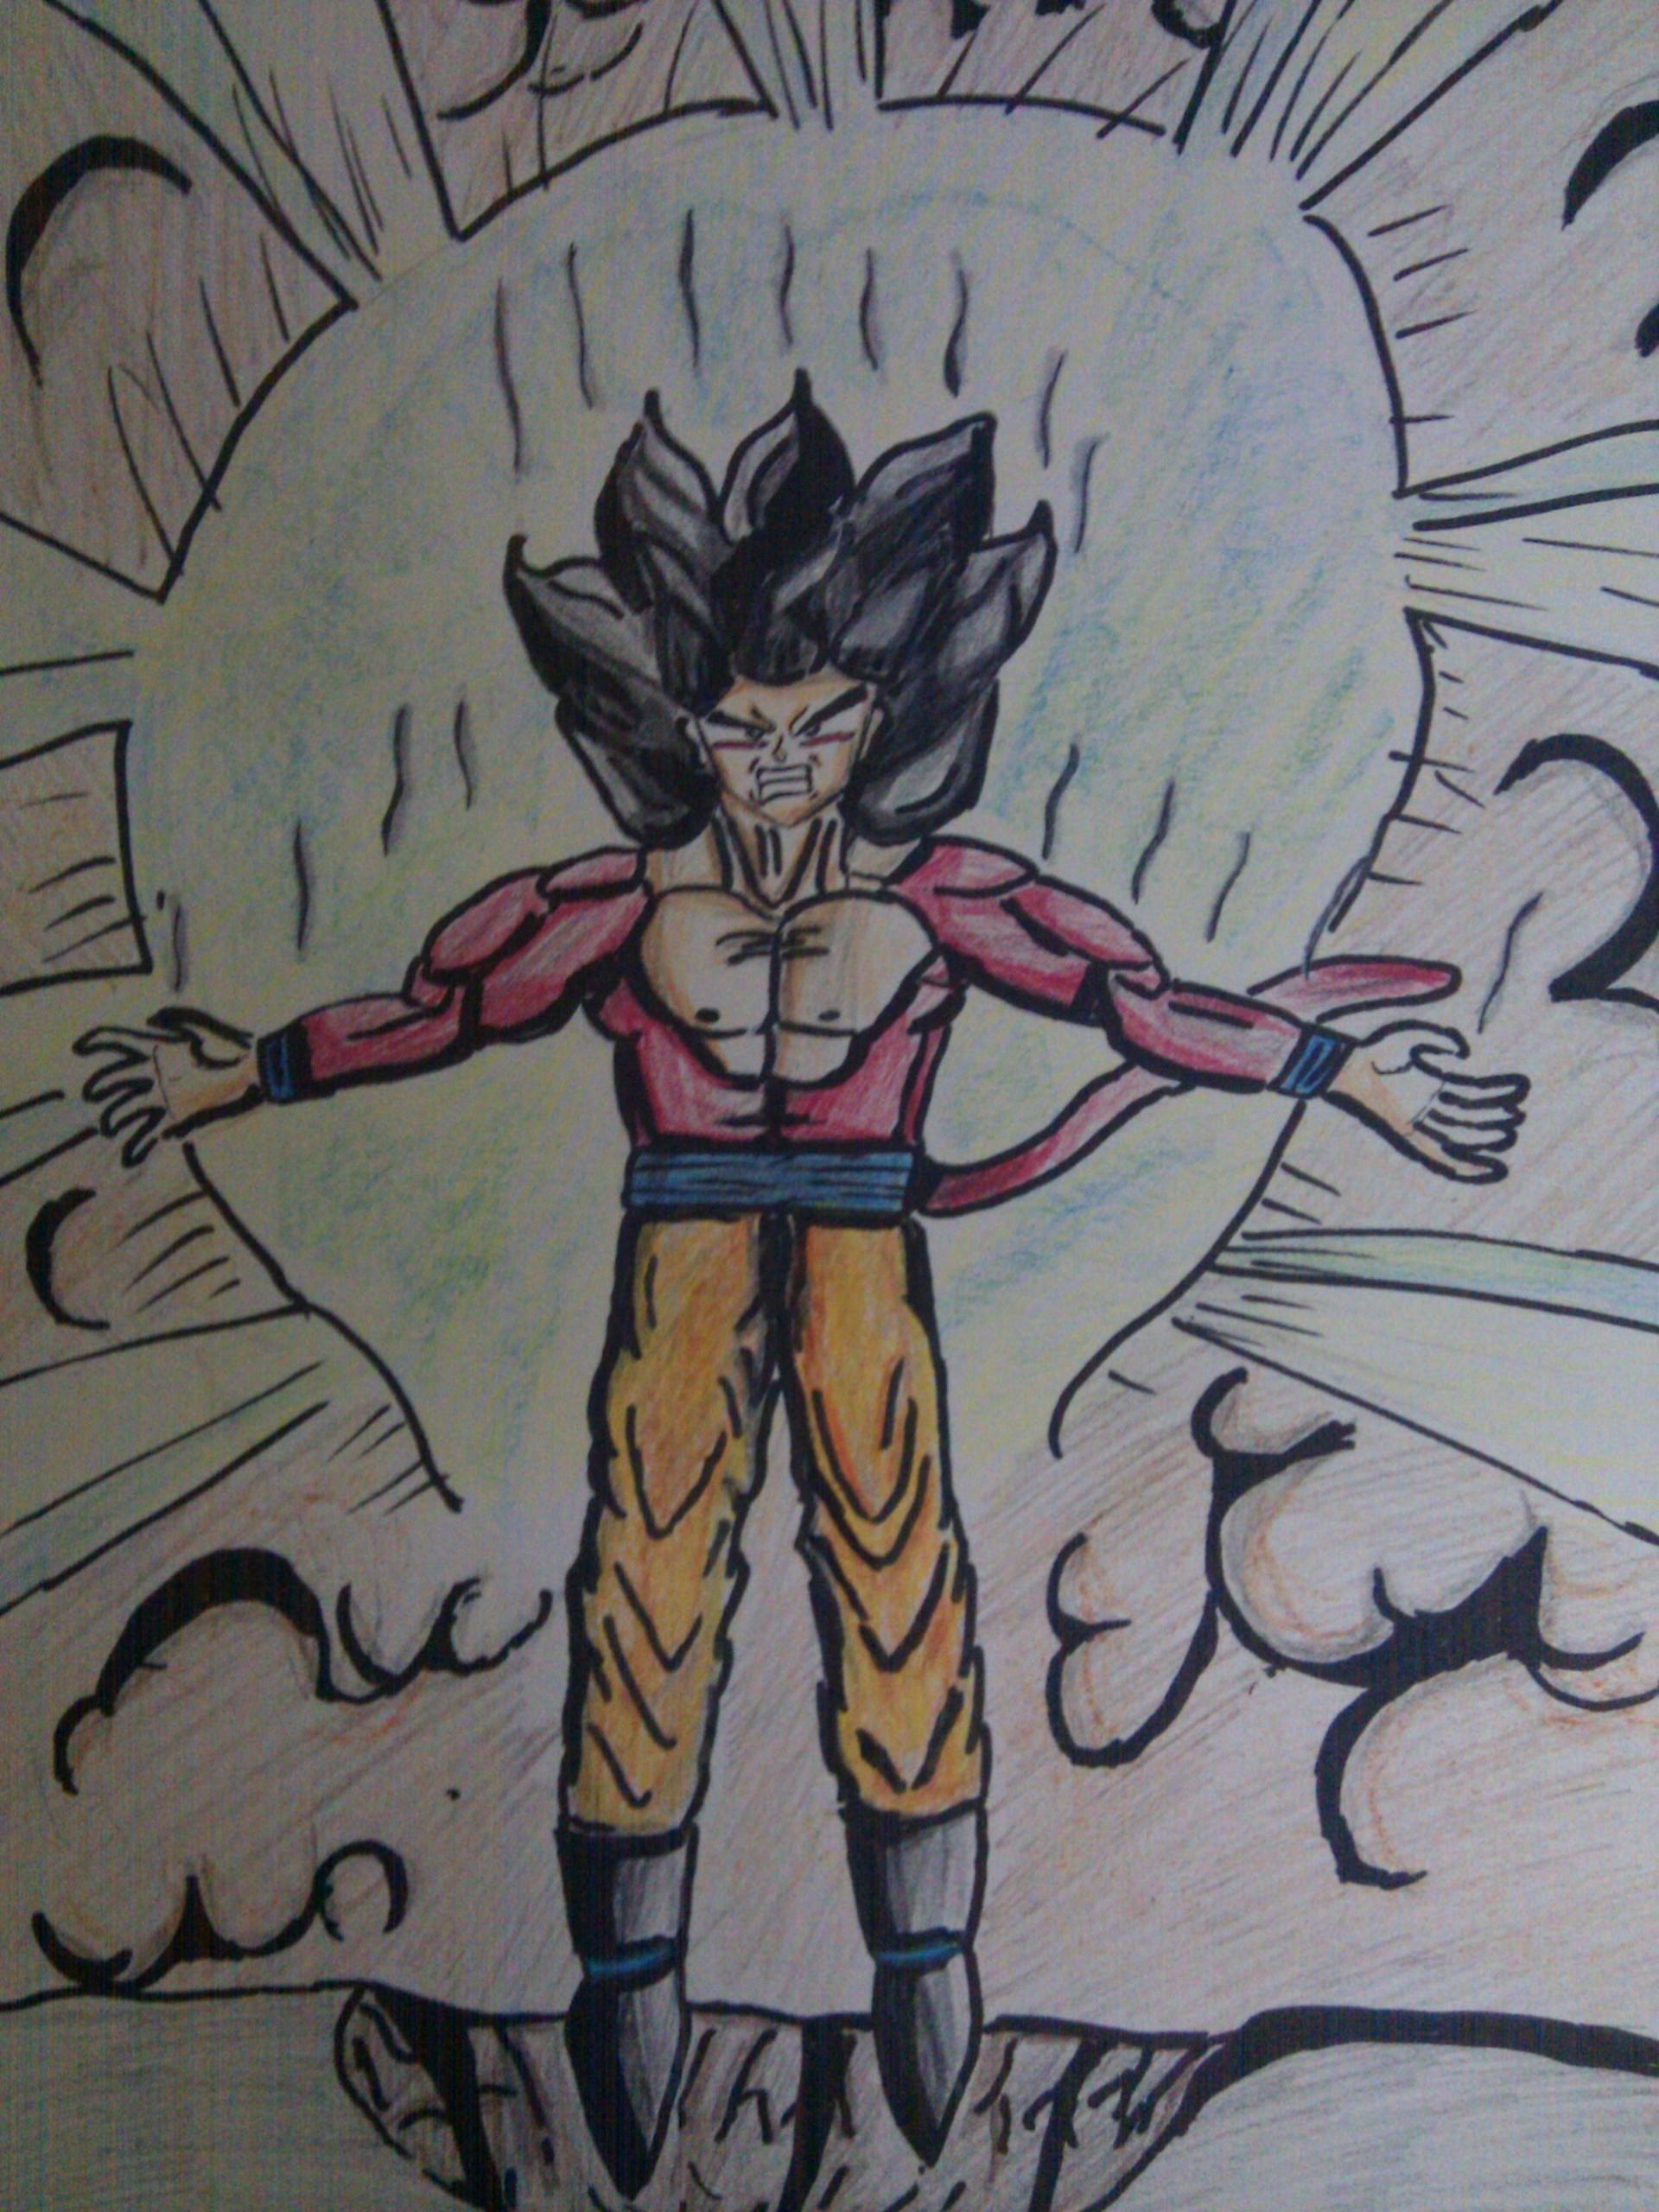 Angry Goku Ssj4 Dragon Ball Z Fa Art 22171236 Fanpop